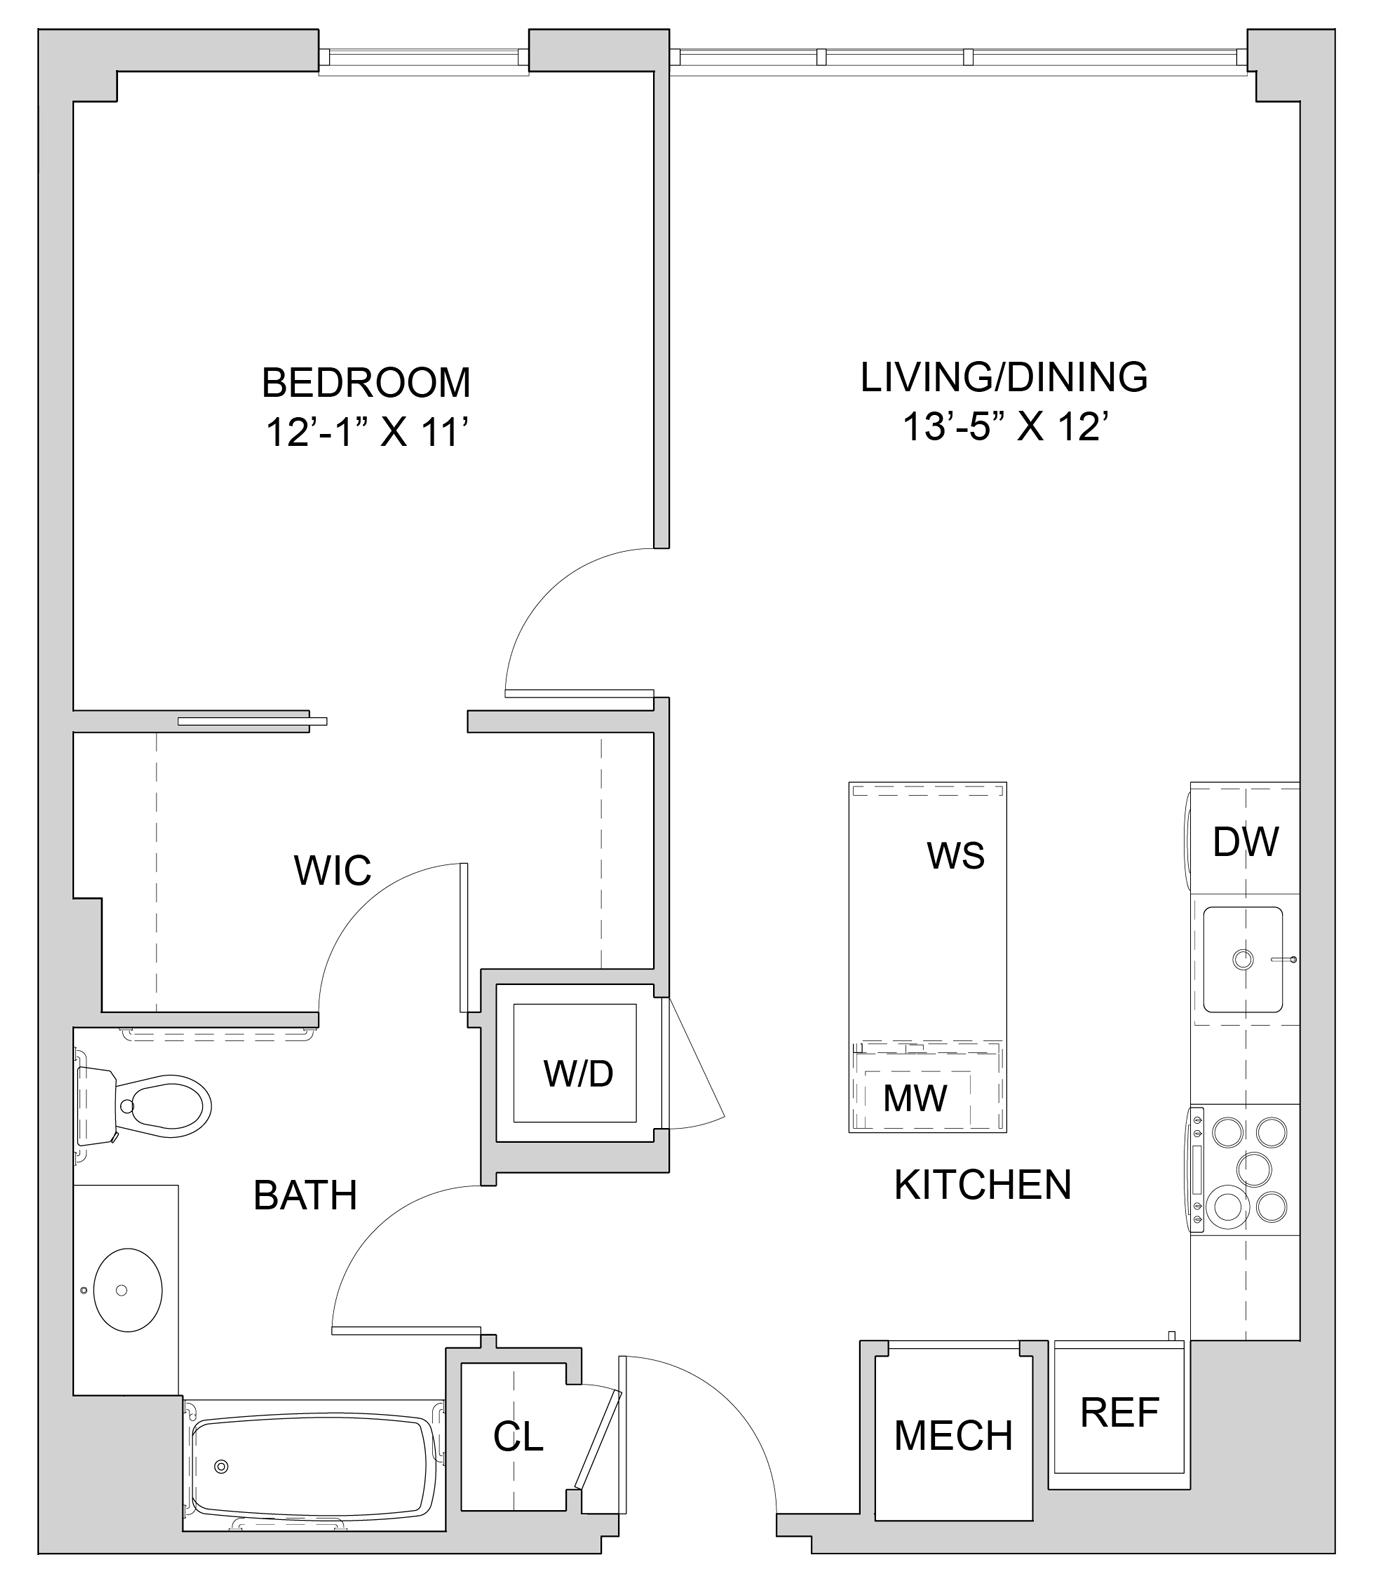 Floorplan S130 Image